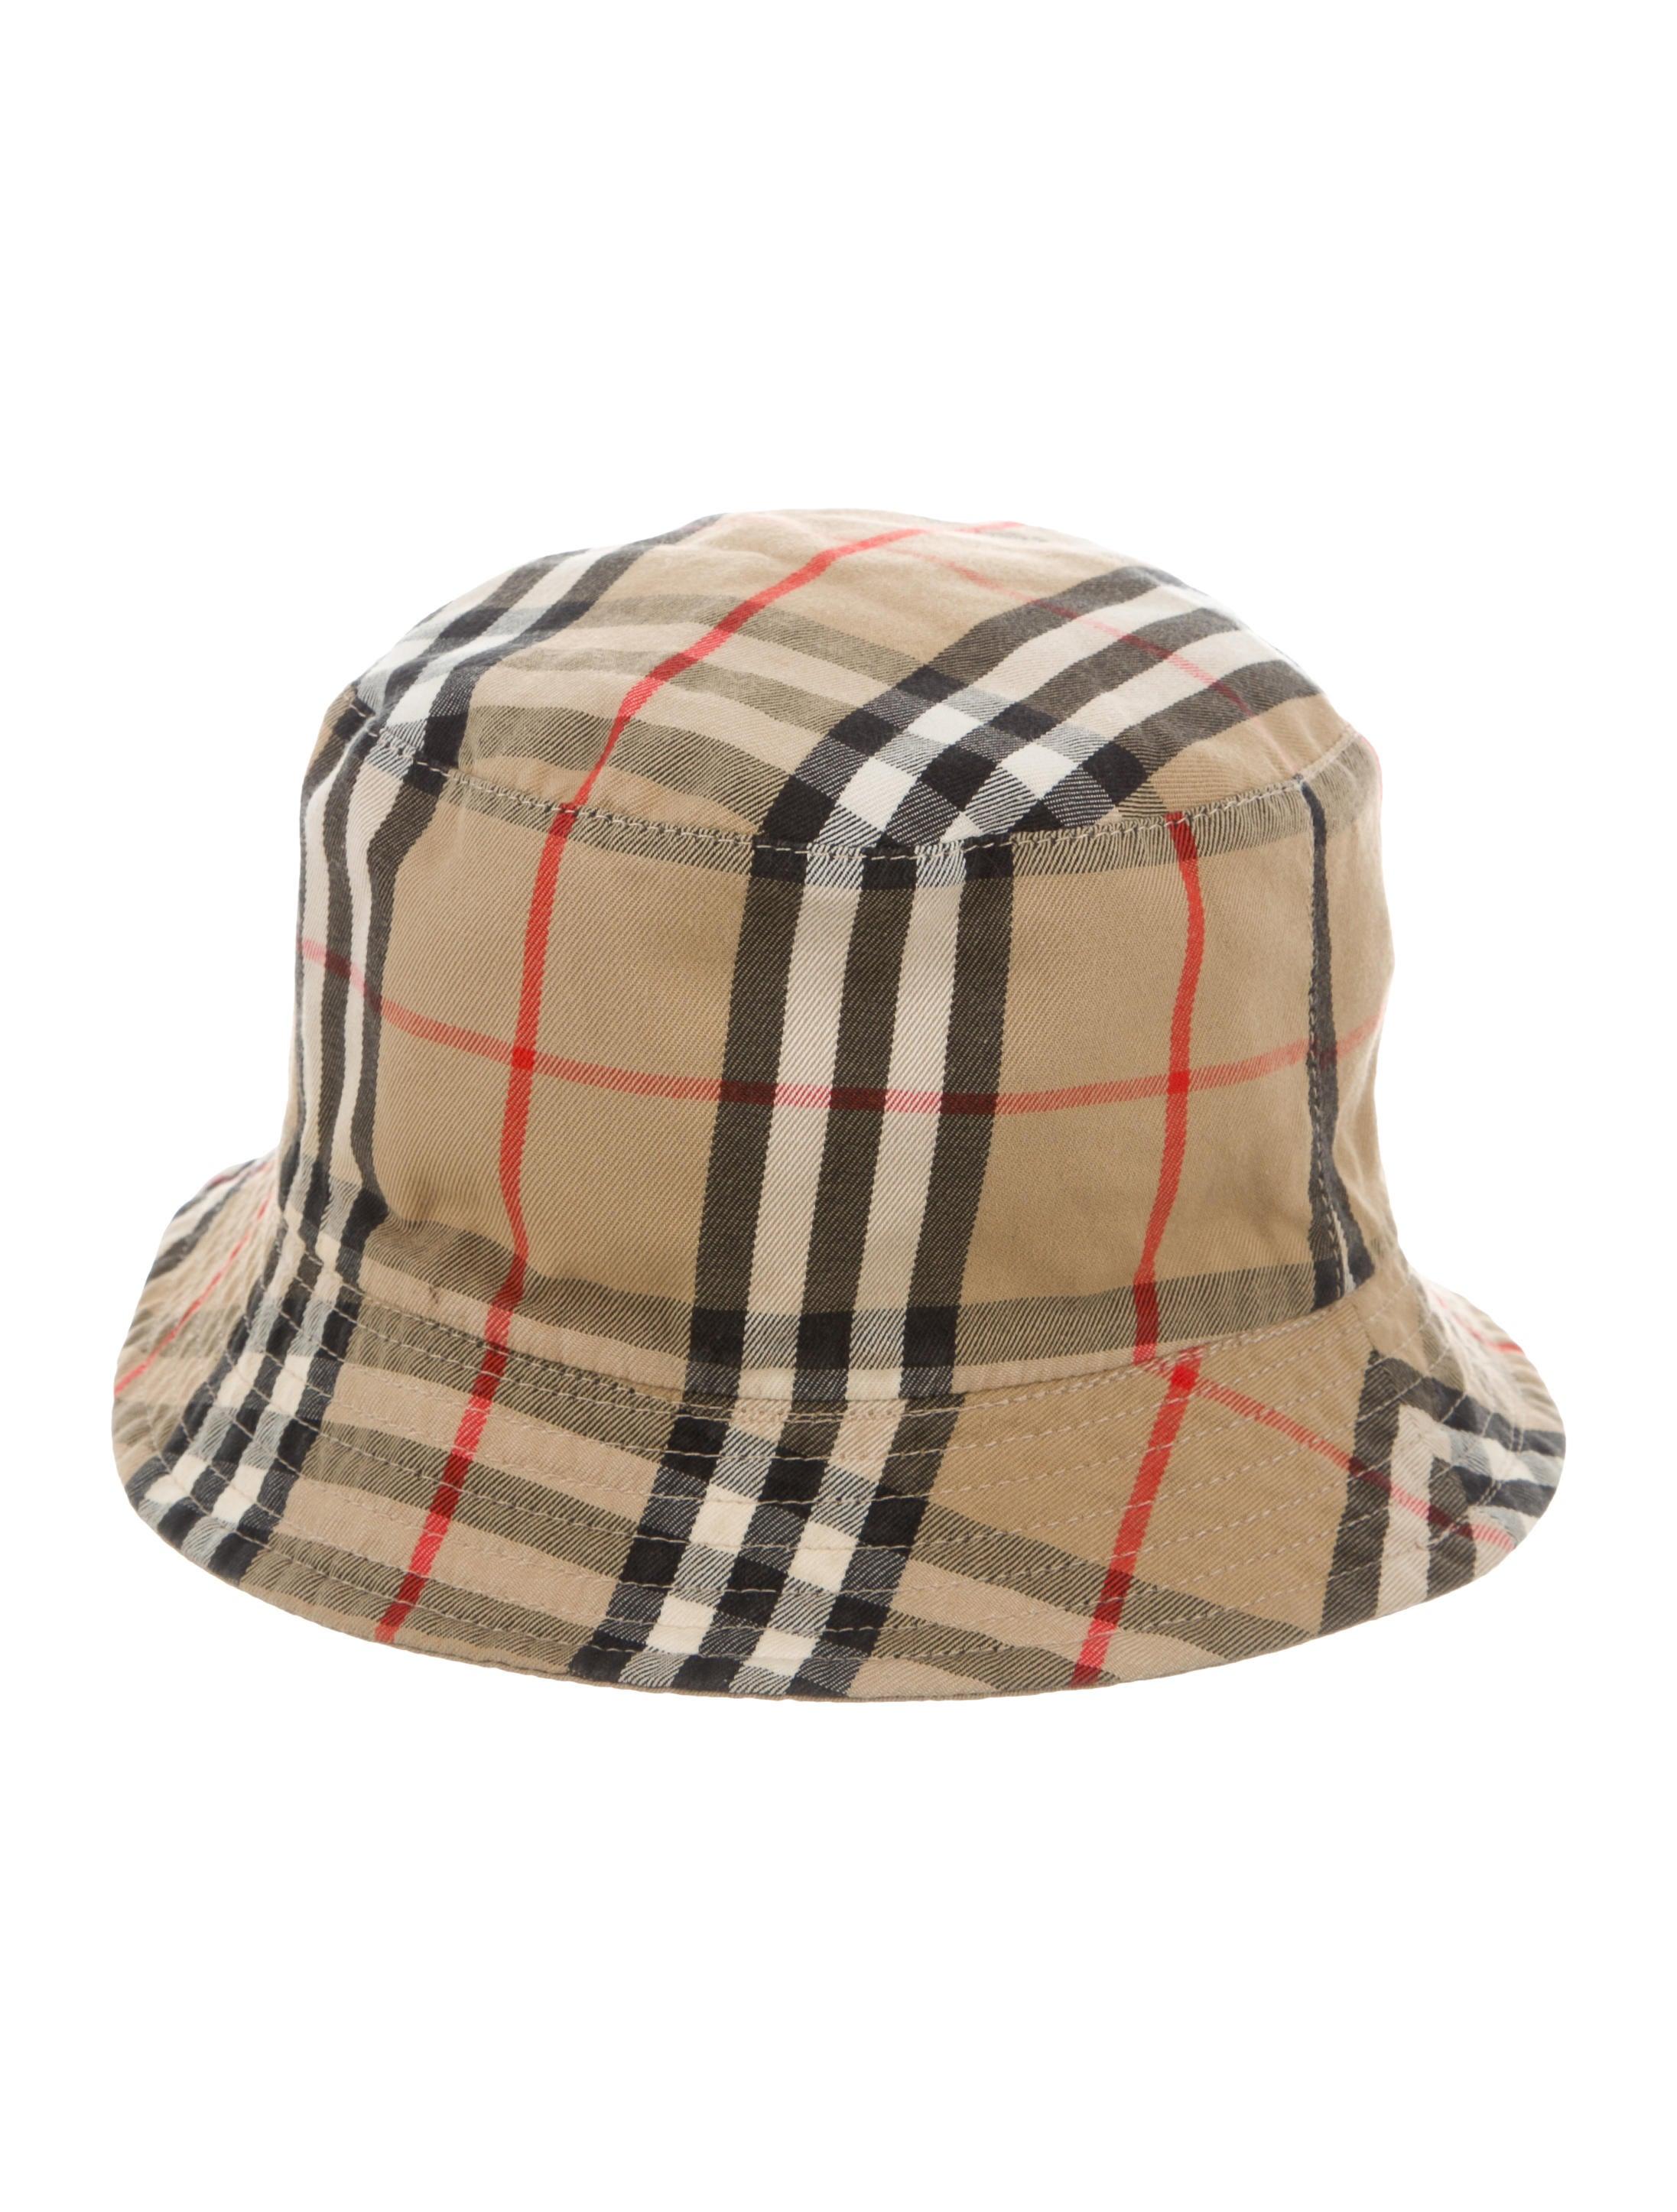 Burberry Nova Check Reversible Hat - Accessories - BUR96630  ee1c55b98e6